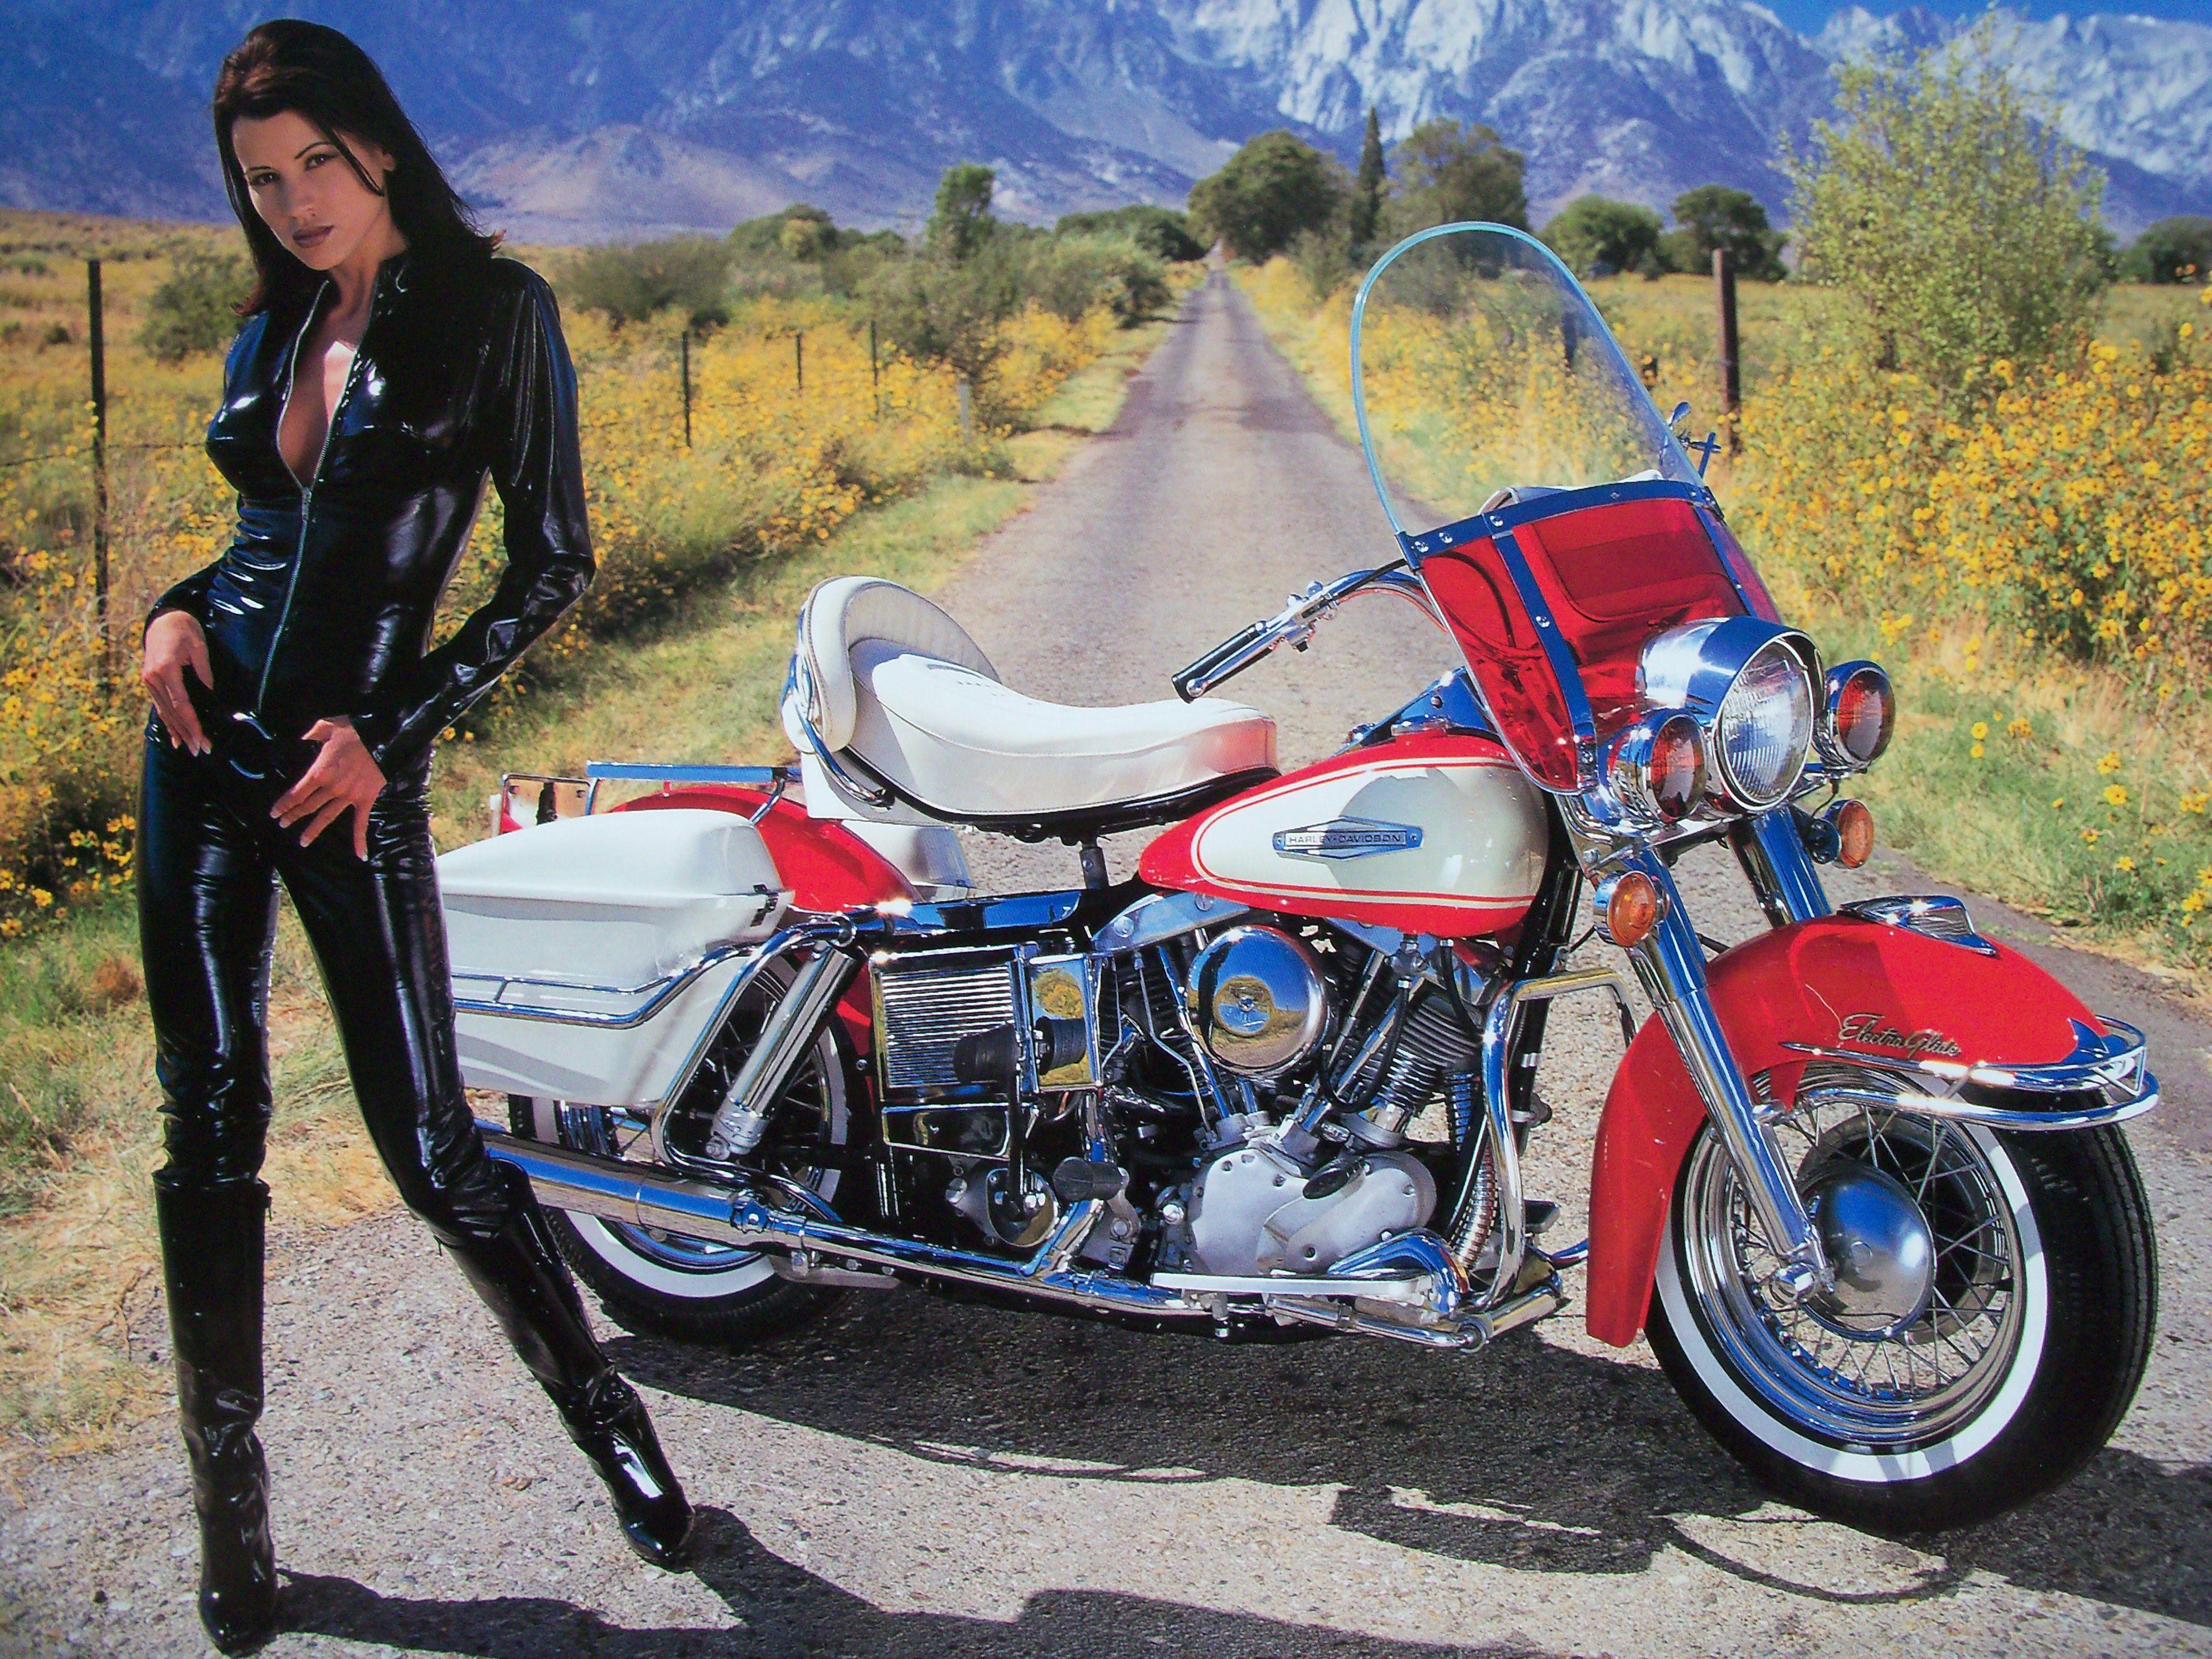 women+motorcycle | 1966 Harley Davidson FLH Electra Glide ...